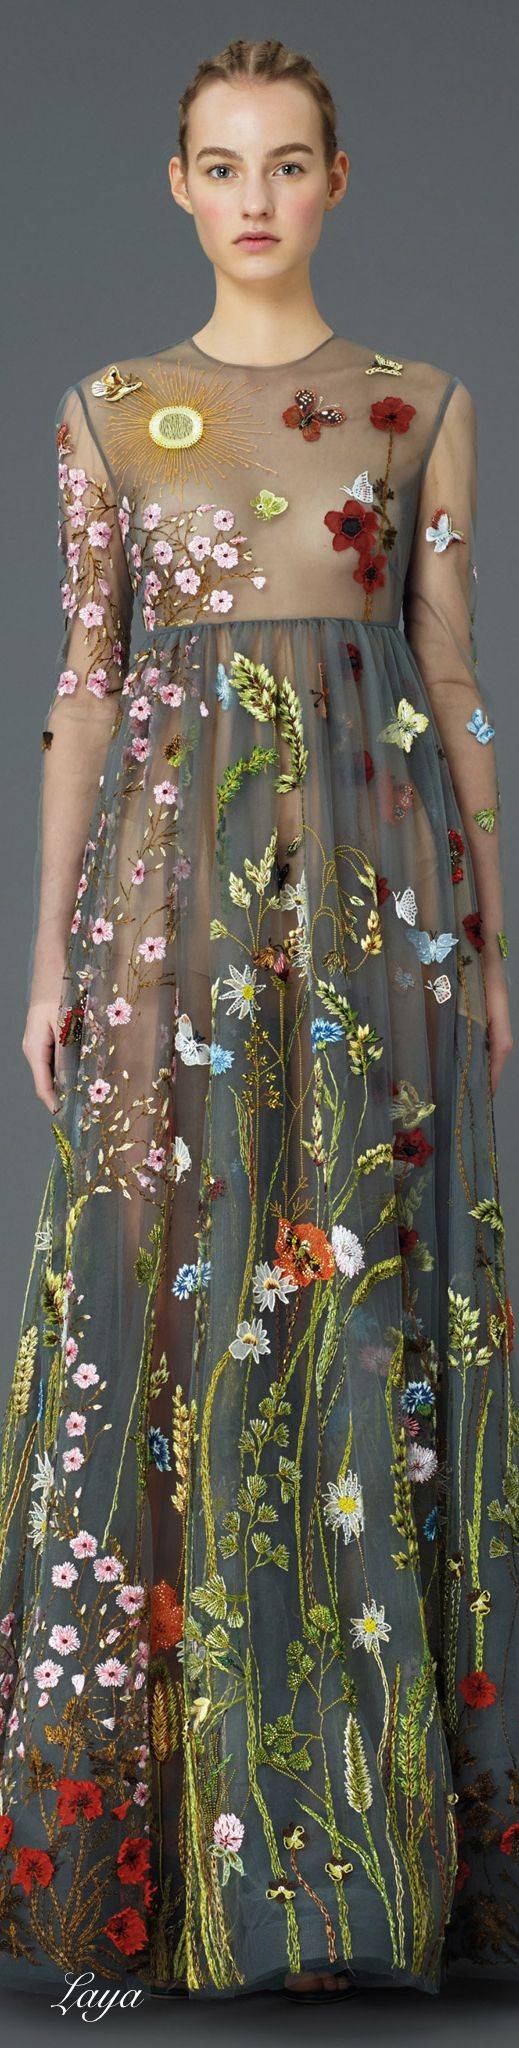 best womenus fashion images on pinterest